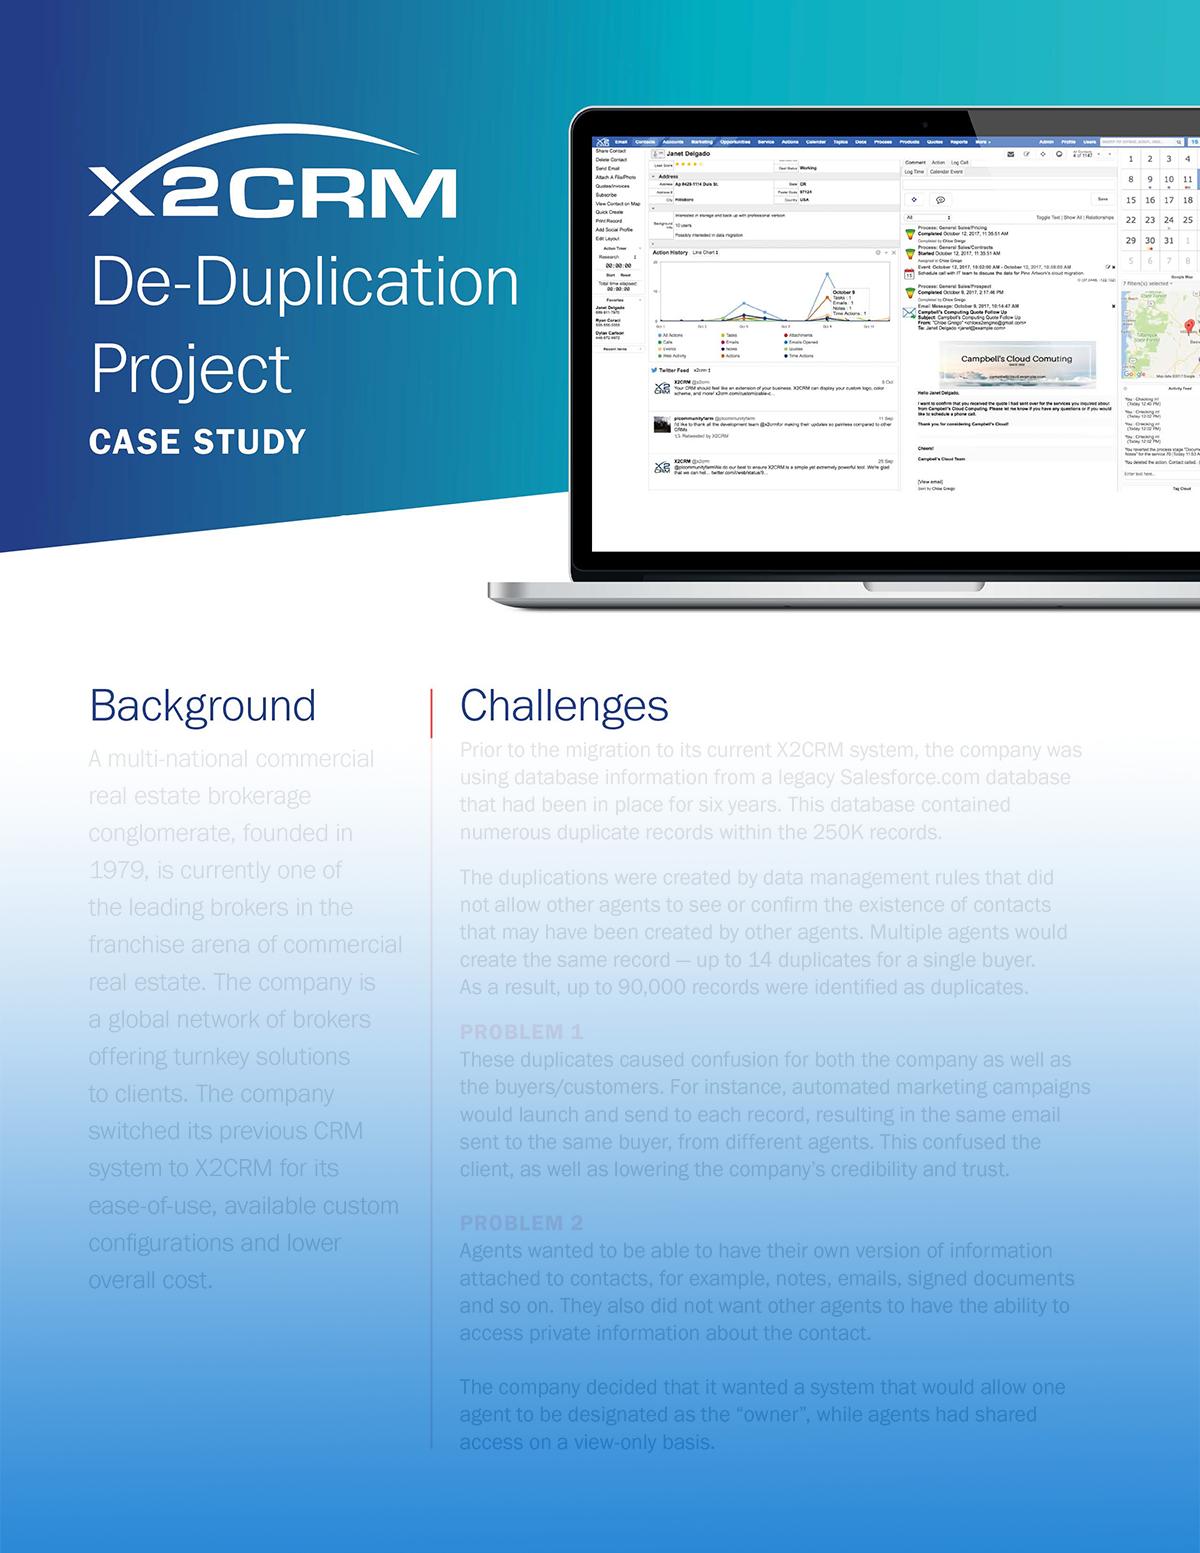 X2CRM De-duplcation Case Studythumb.png